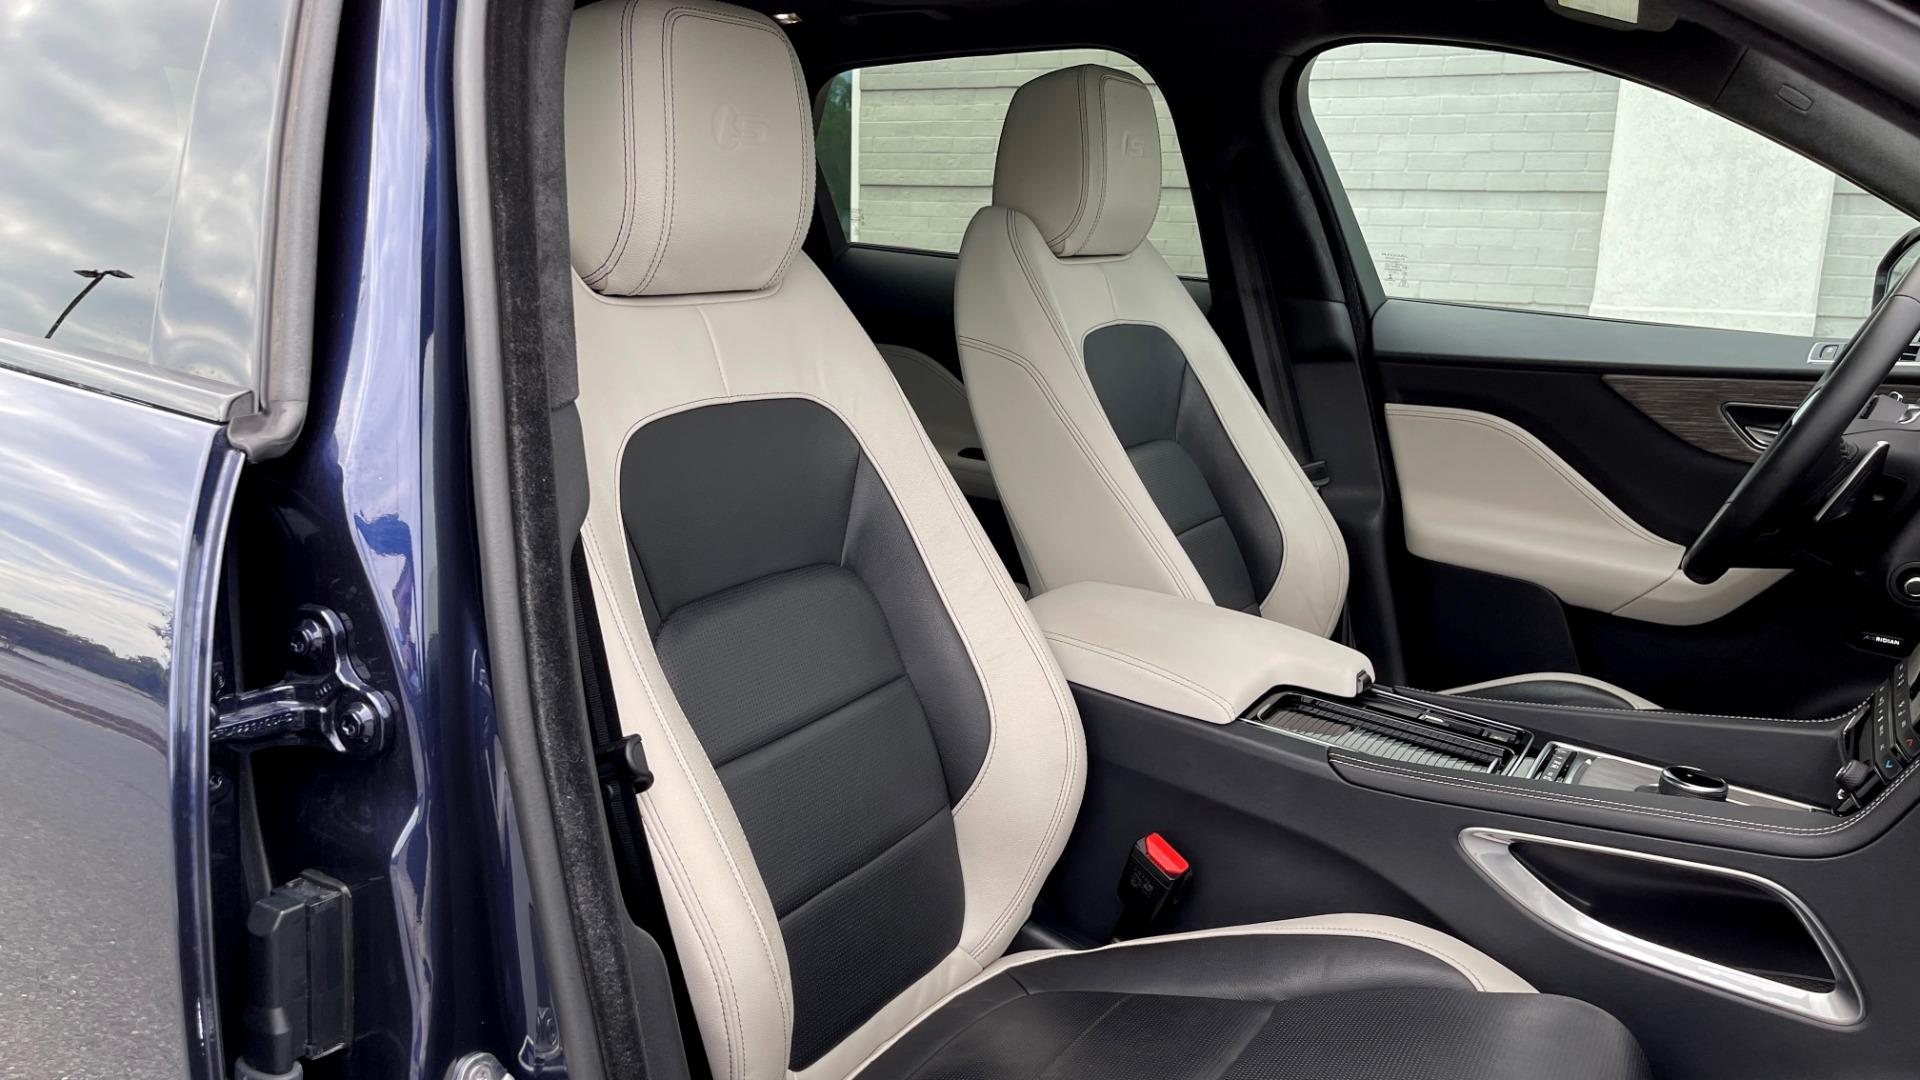 Used 2019 Jaguar F-PACE S / DRIVE PKG / BSA / HUD / BLACK EXT PKG / REARVIEW for sale $50,995 at Formula Imports in Charlotte NC 28227 65